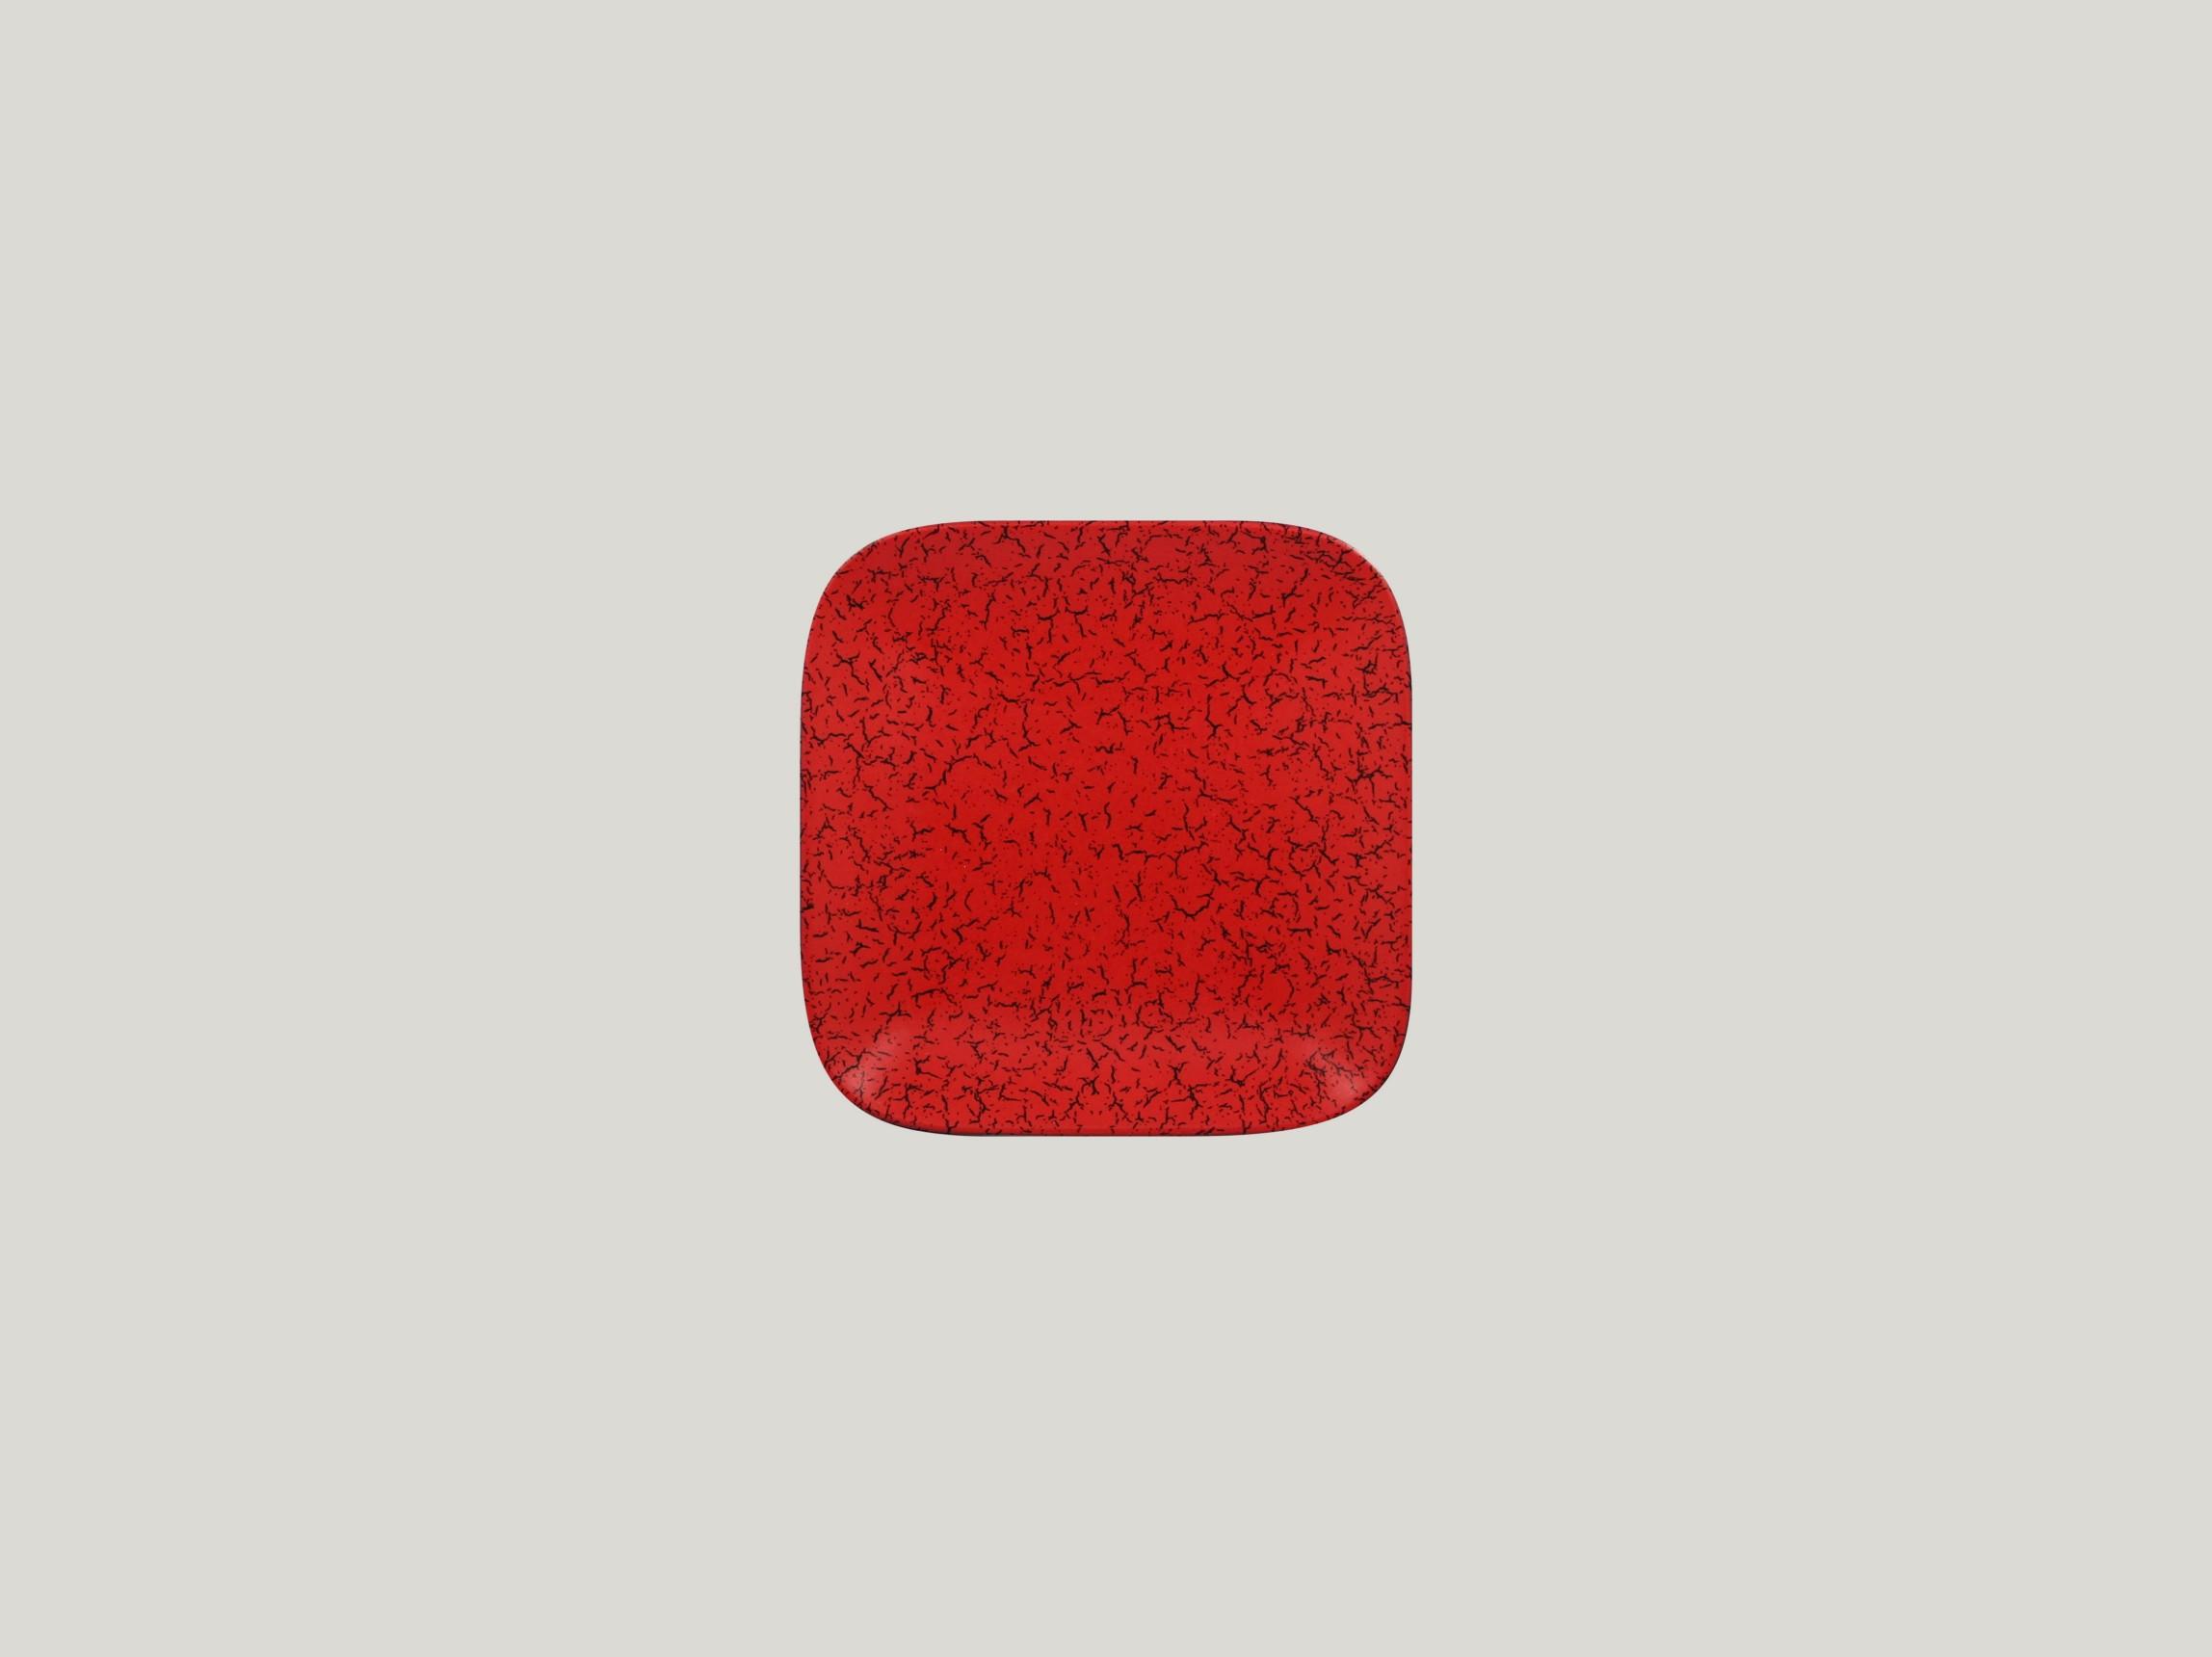 Talíř čtvercový 15 x 15 cm - červená